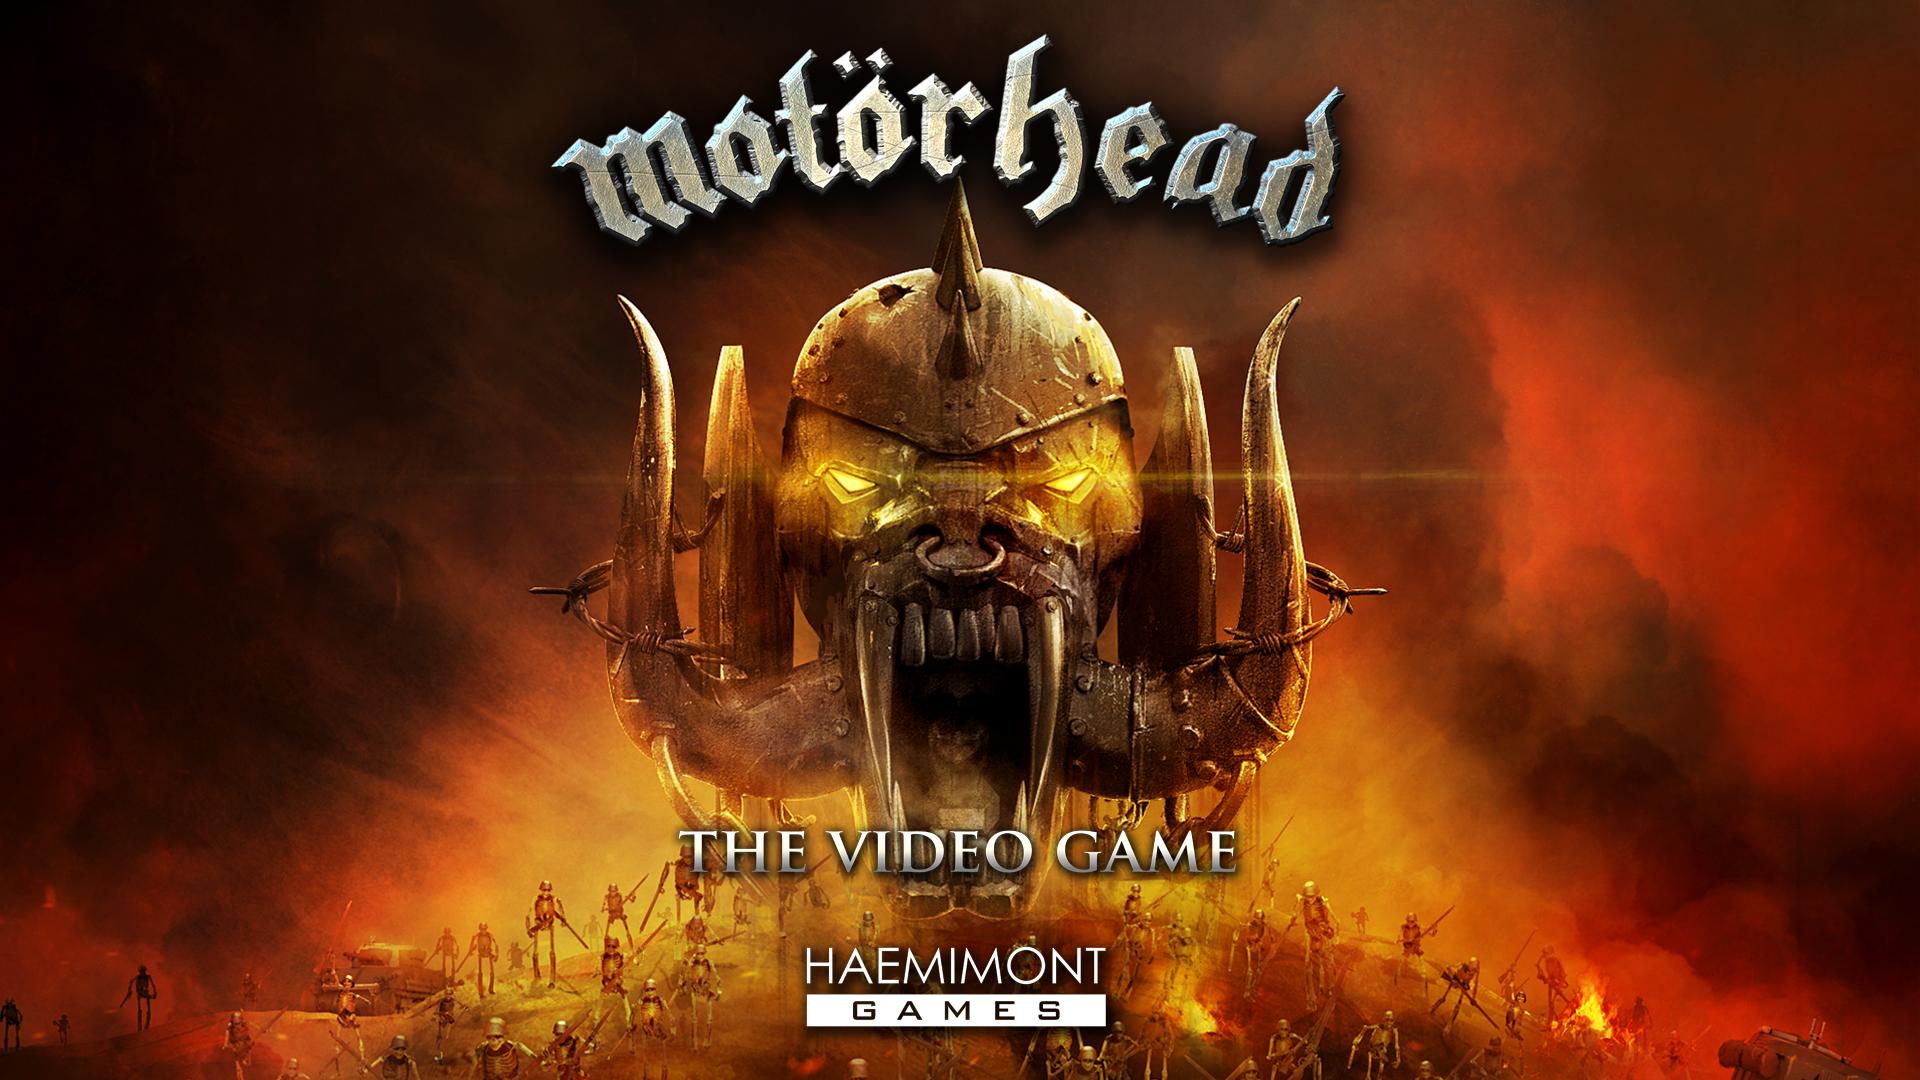 Motörhead - The Video Game